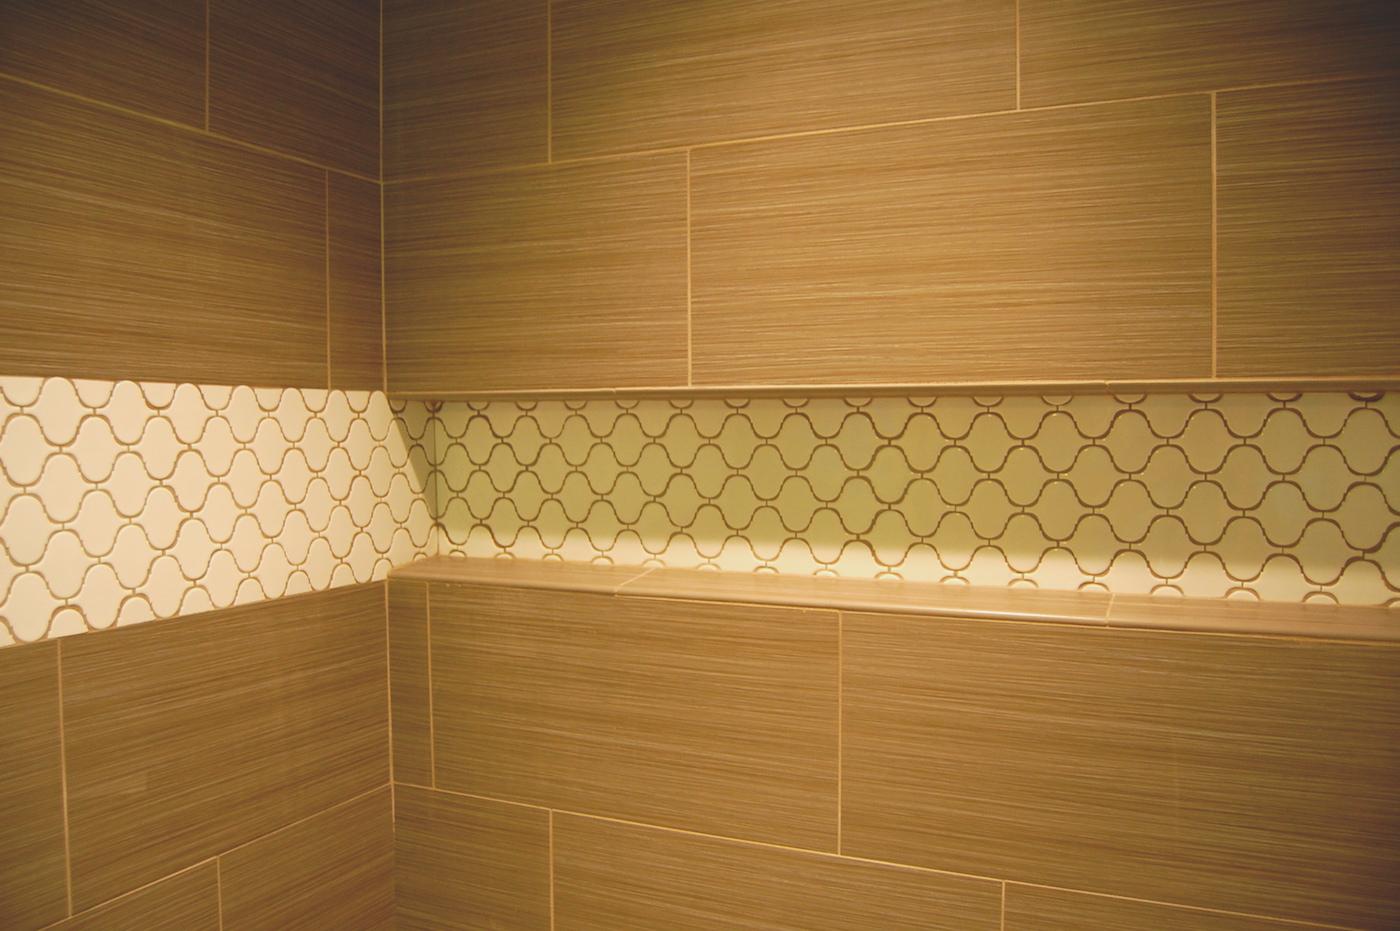 After (Tile Work in Master Suite)